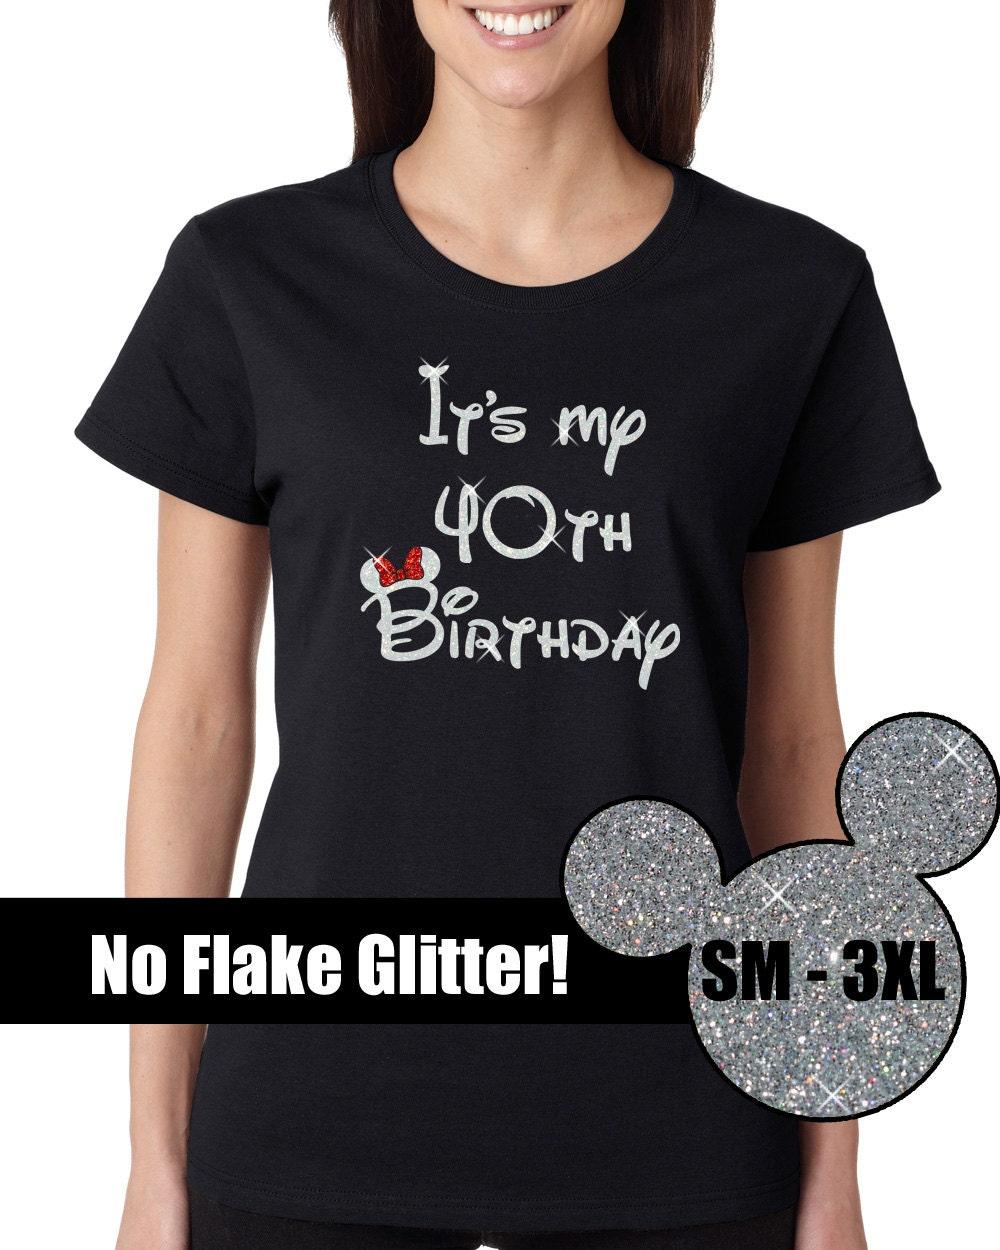 GLITTER Favorite Disney Birthday Girl 40th Ladies Tee